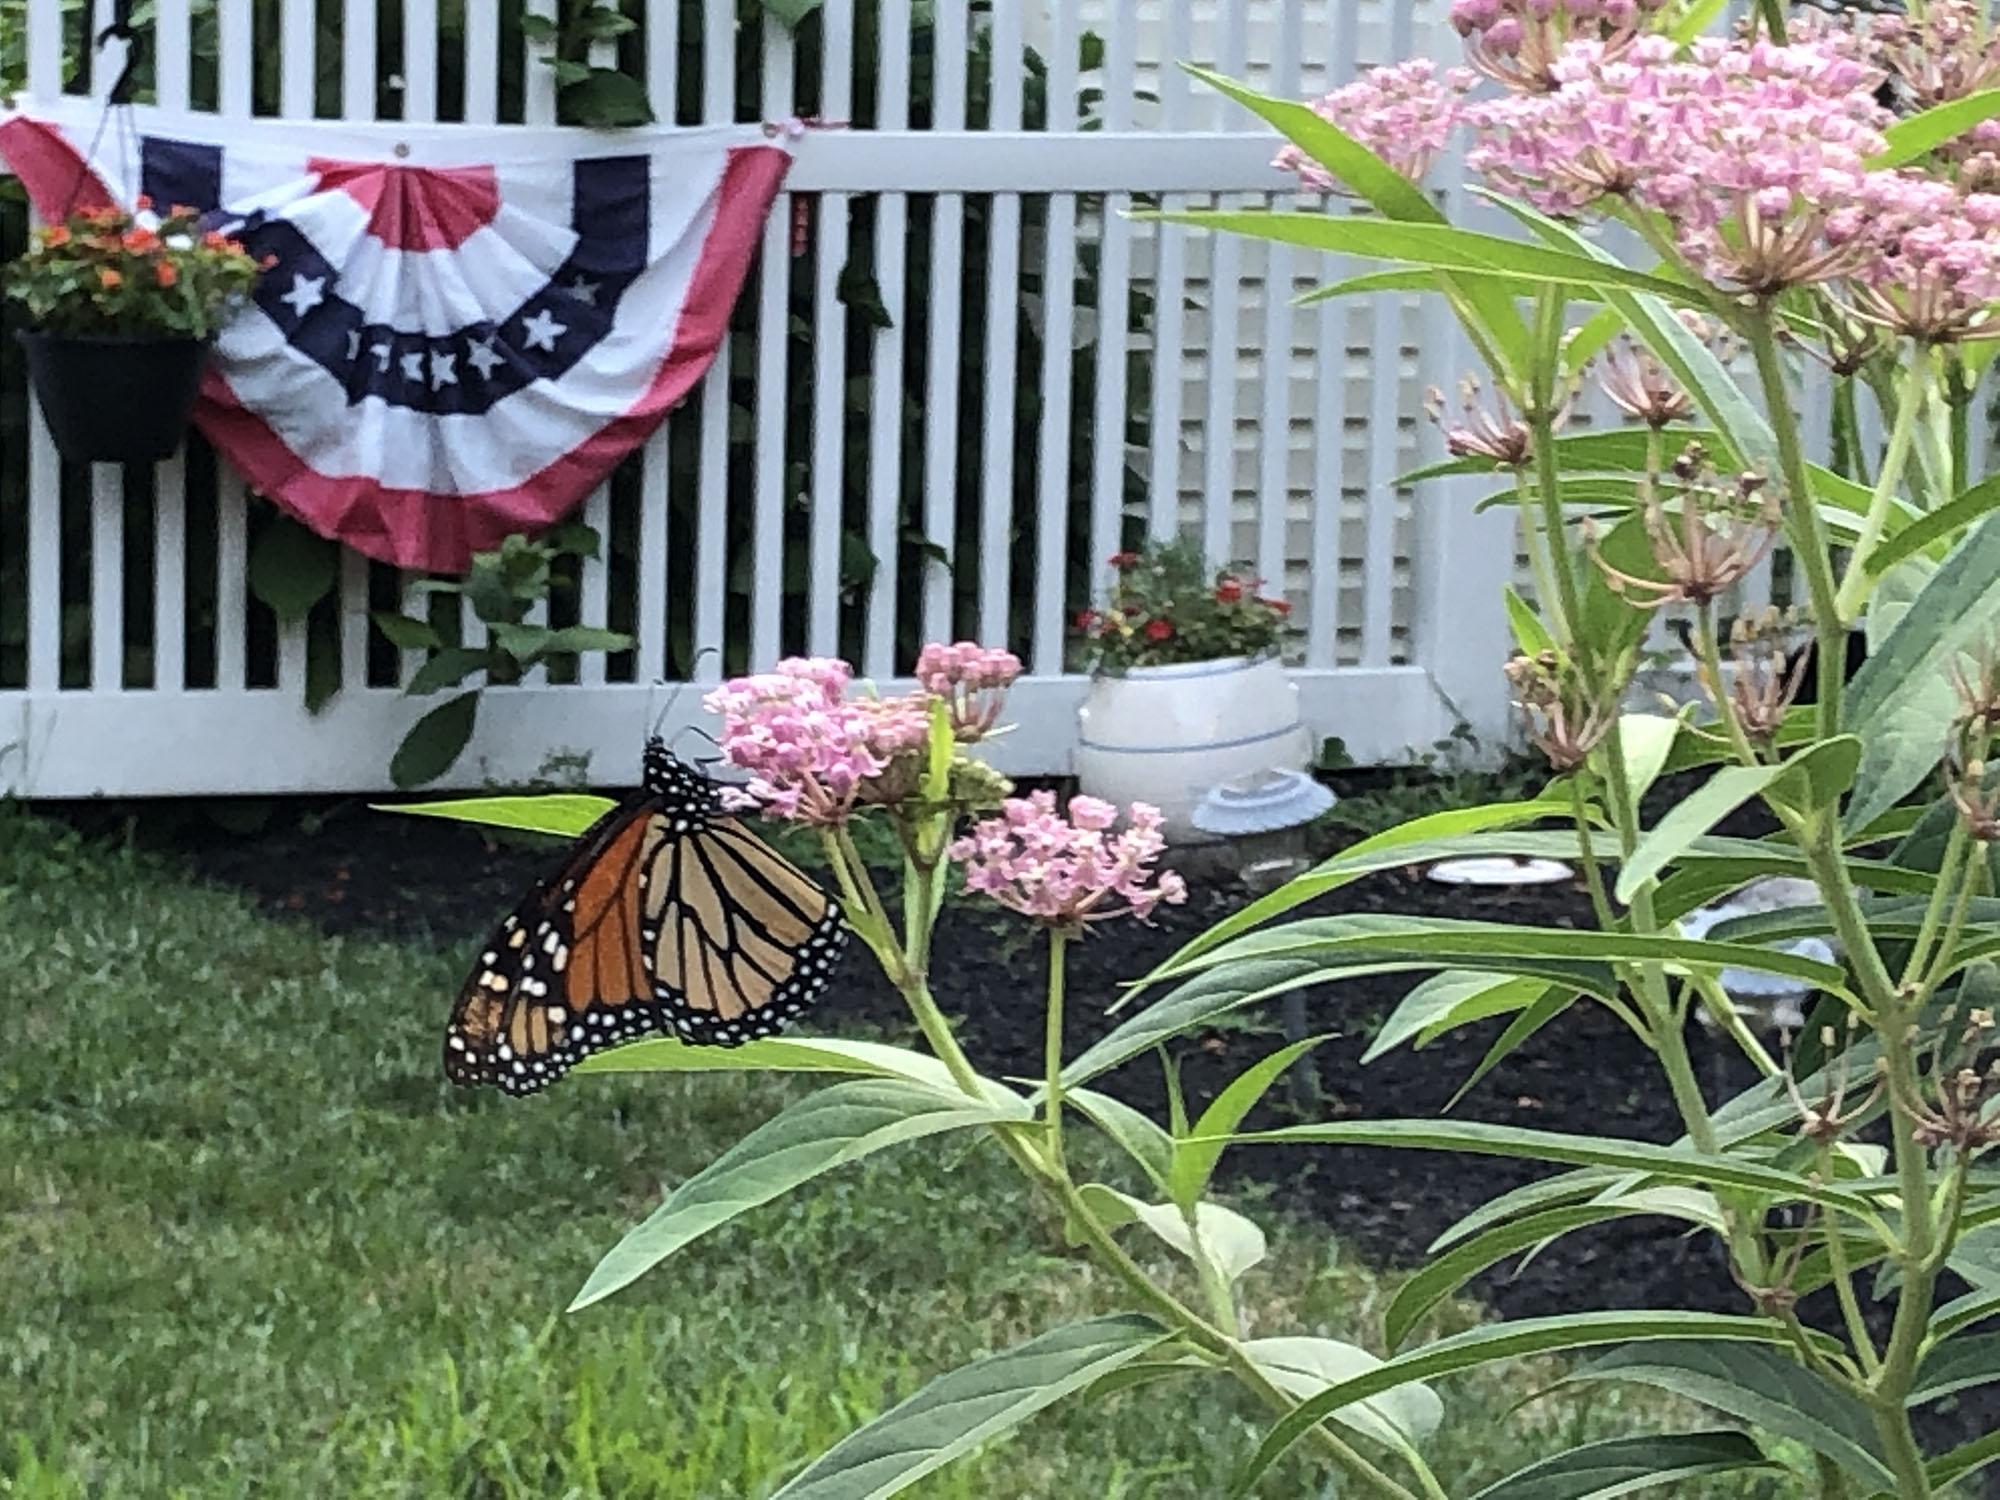 8-16 w-wildlife-butterfly Venuto.jpeg